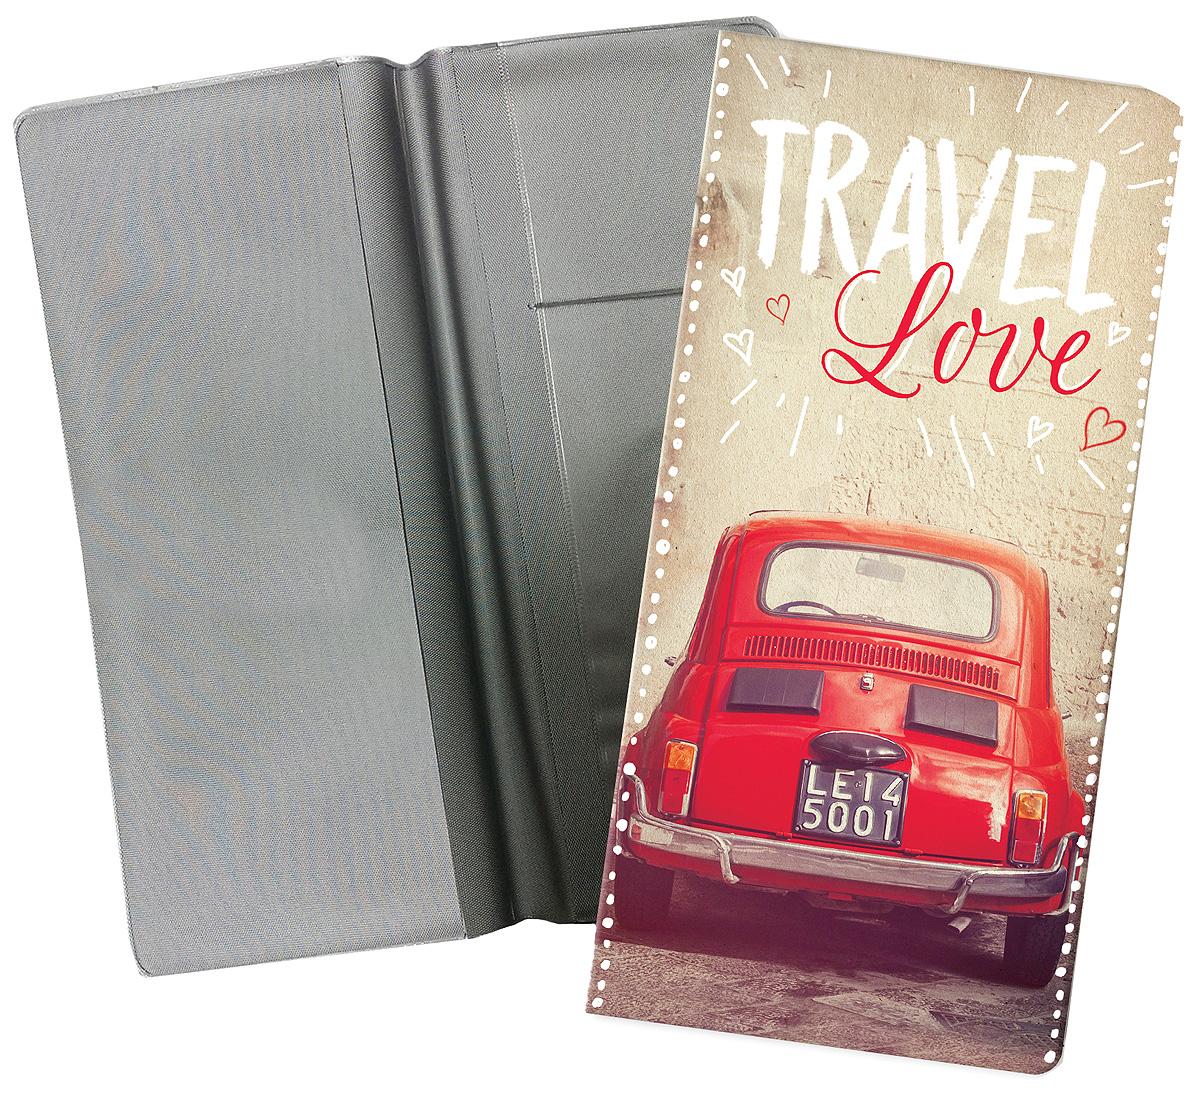 Конверт путешественника Magic Home Авто винтаж, для документов. 77224 конверт путешественника матрешки на красном пвх 20 5 22см 77117